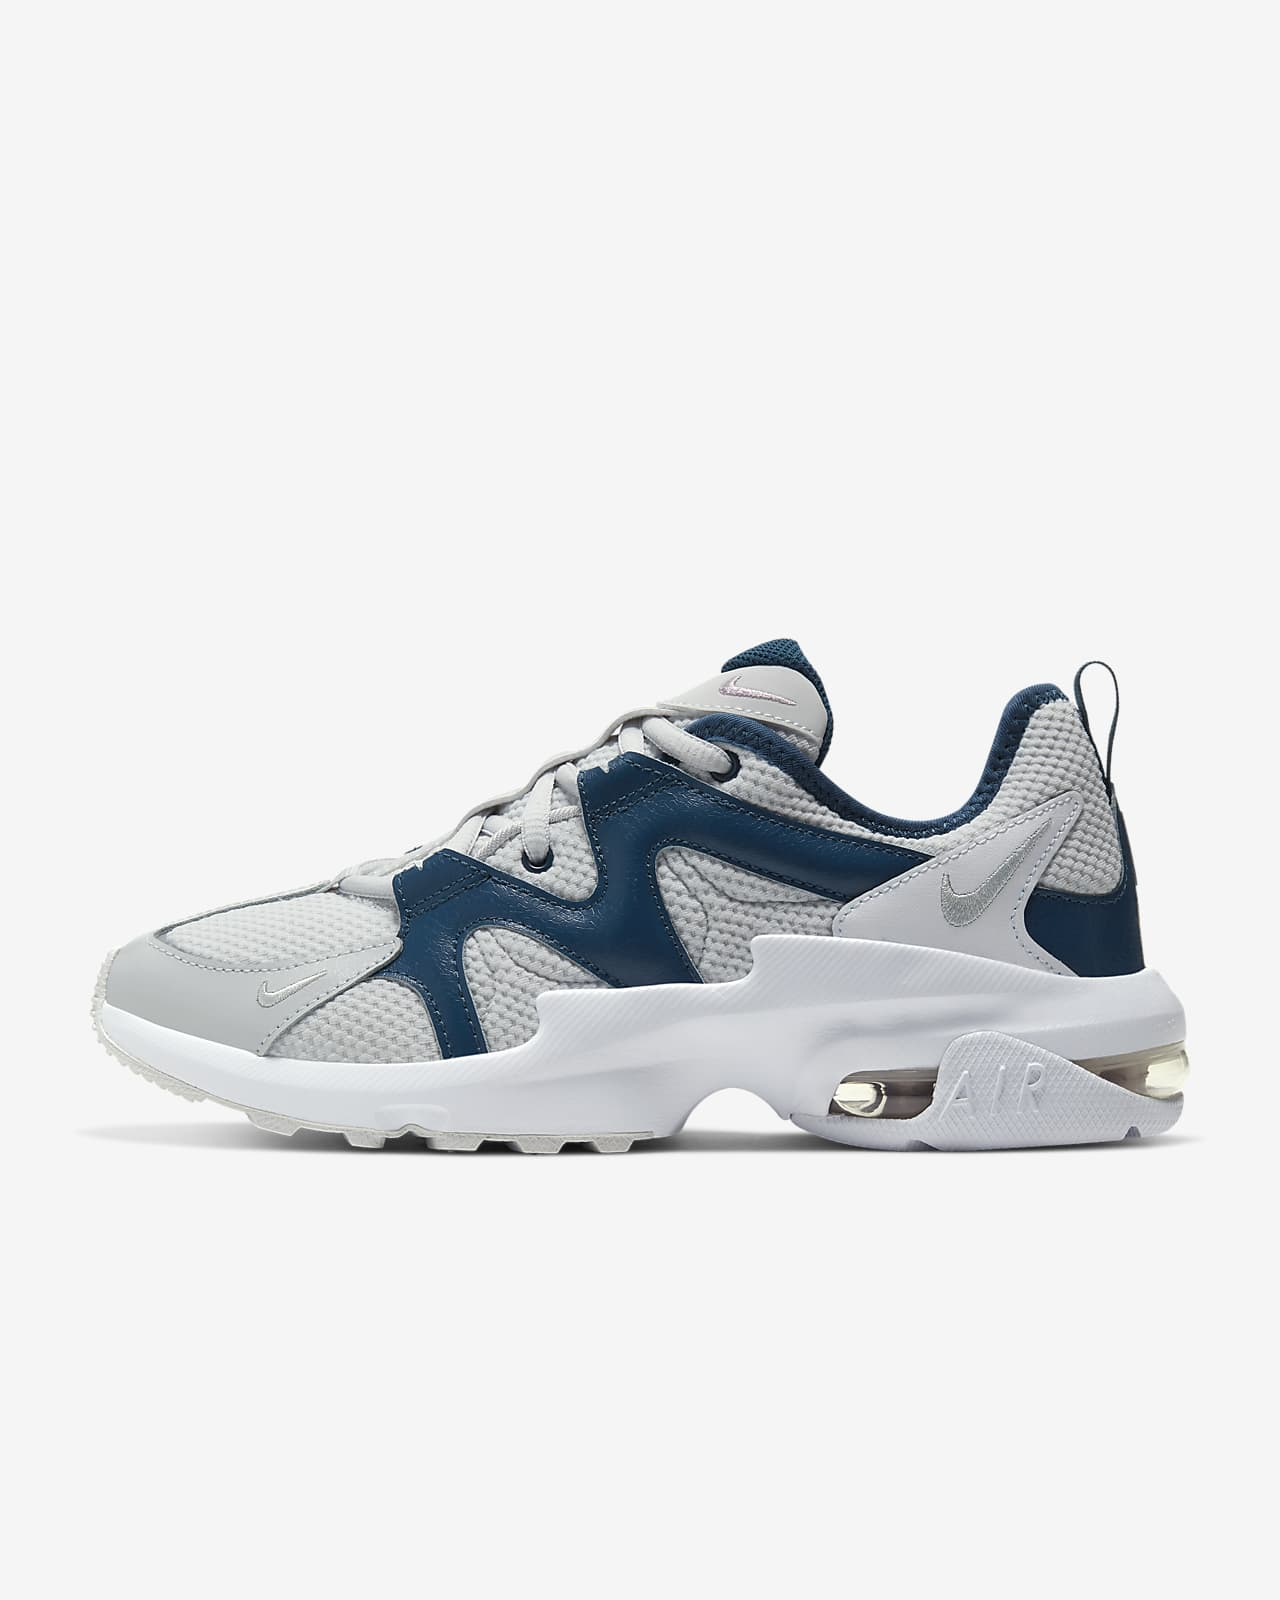 Nike Air Max Graviton 女子运动鞋